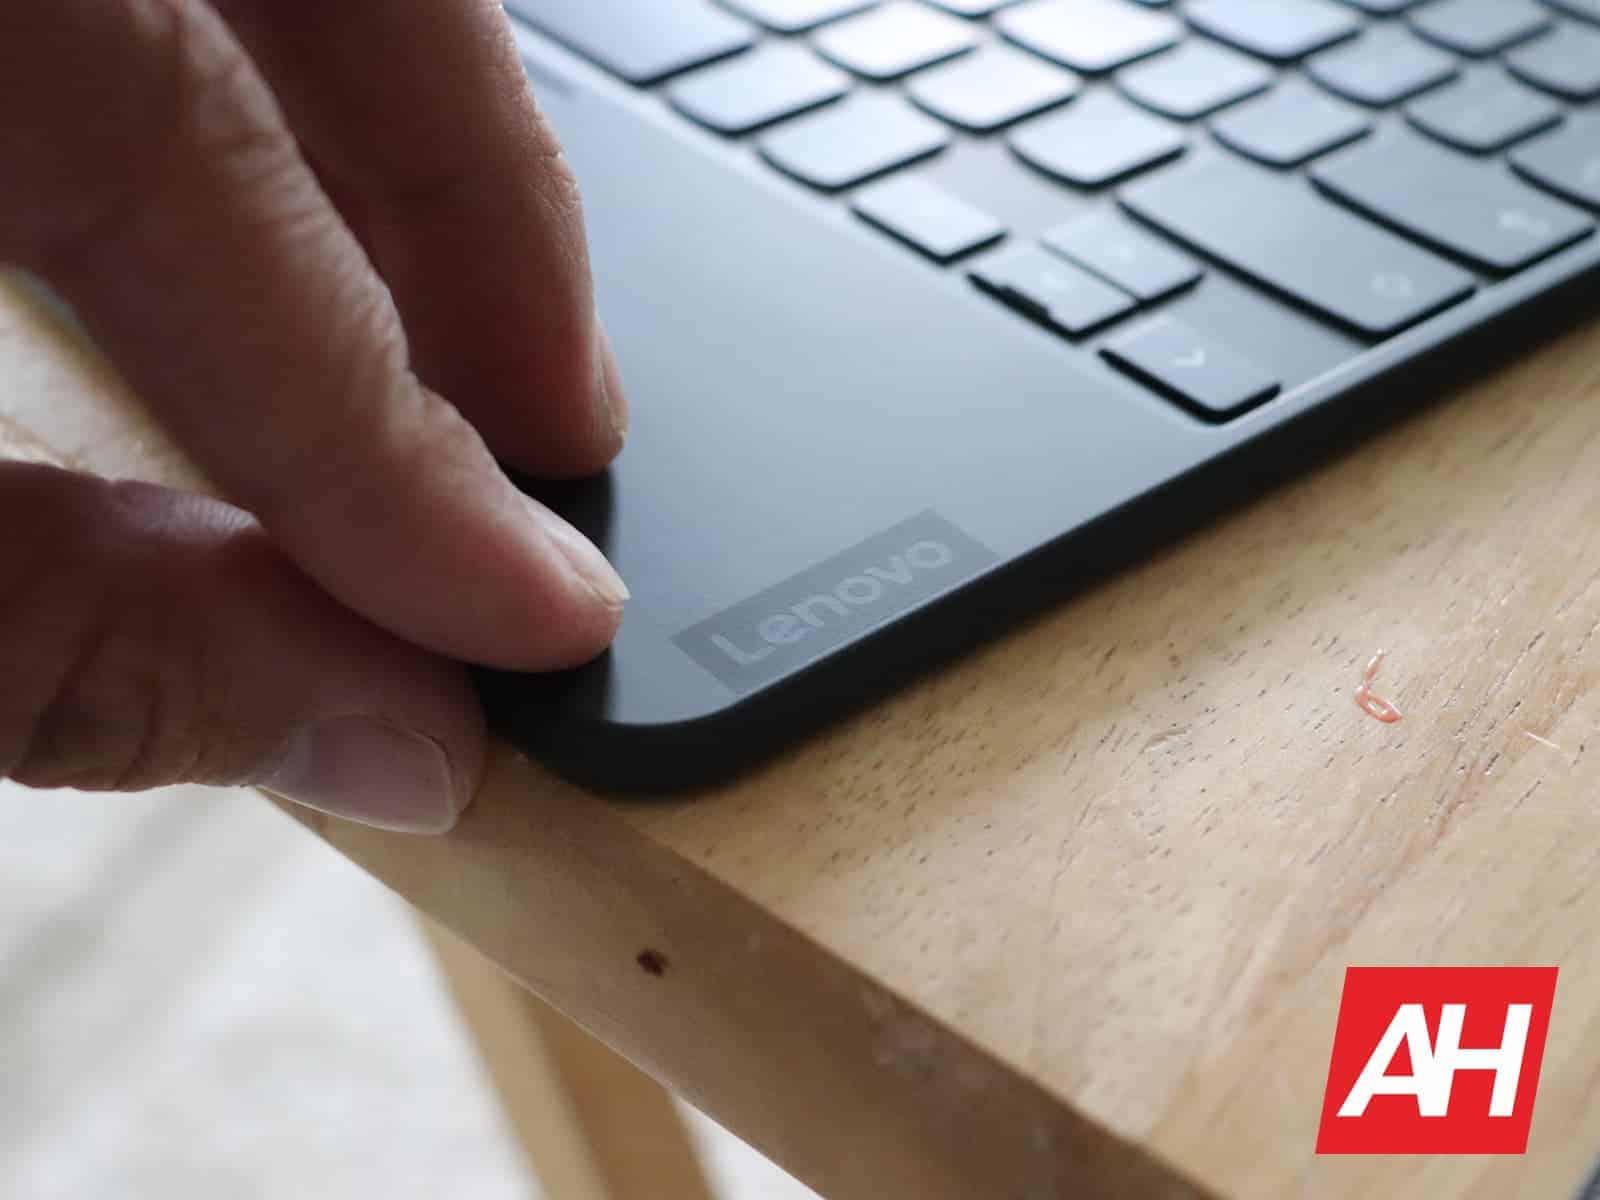 03 1 Lenovo IdeaPad Duet Hardware AH 2020